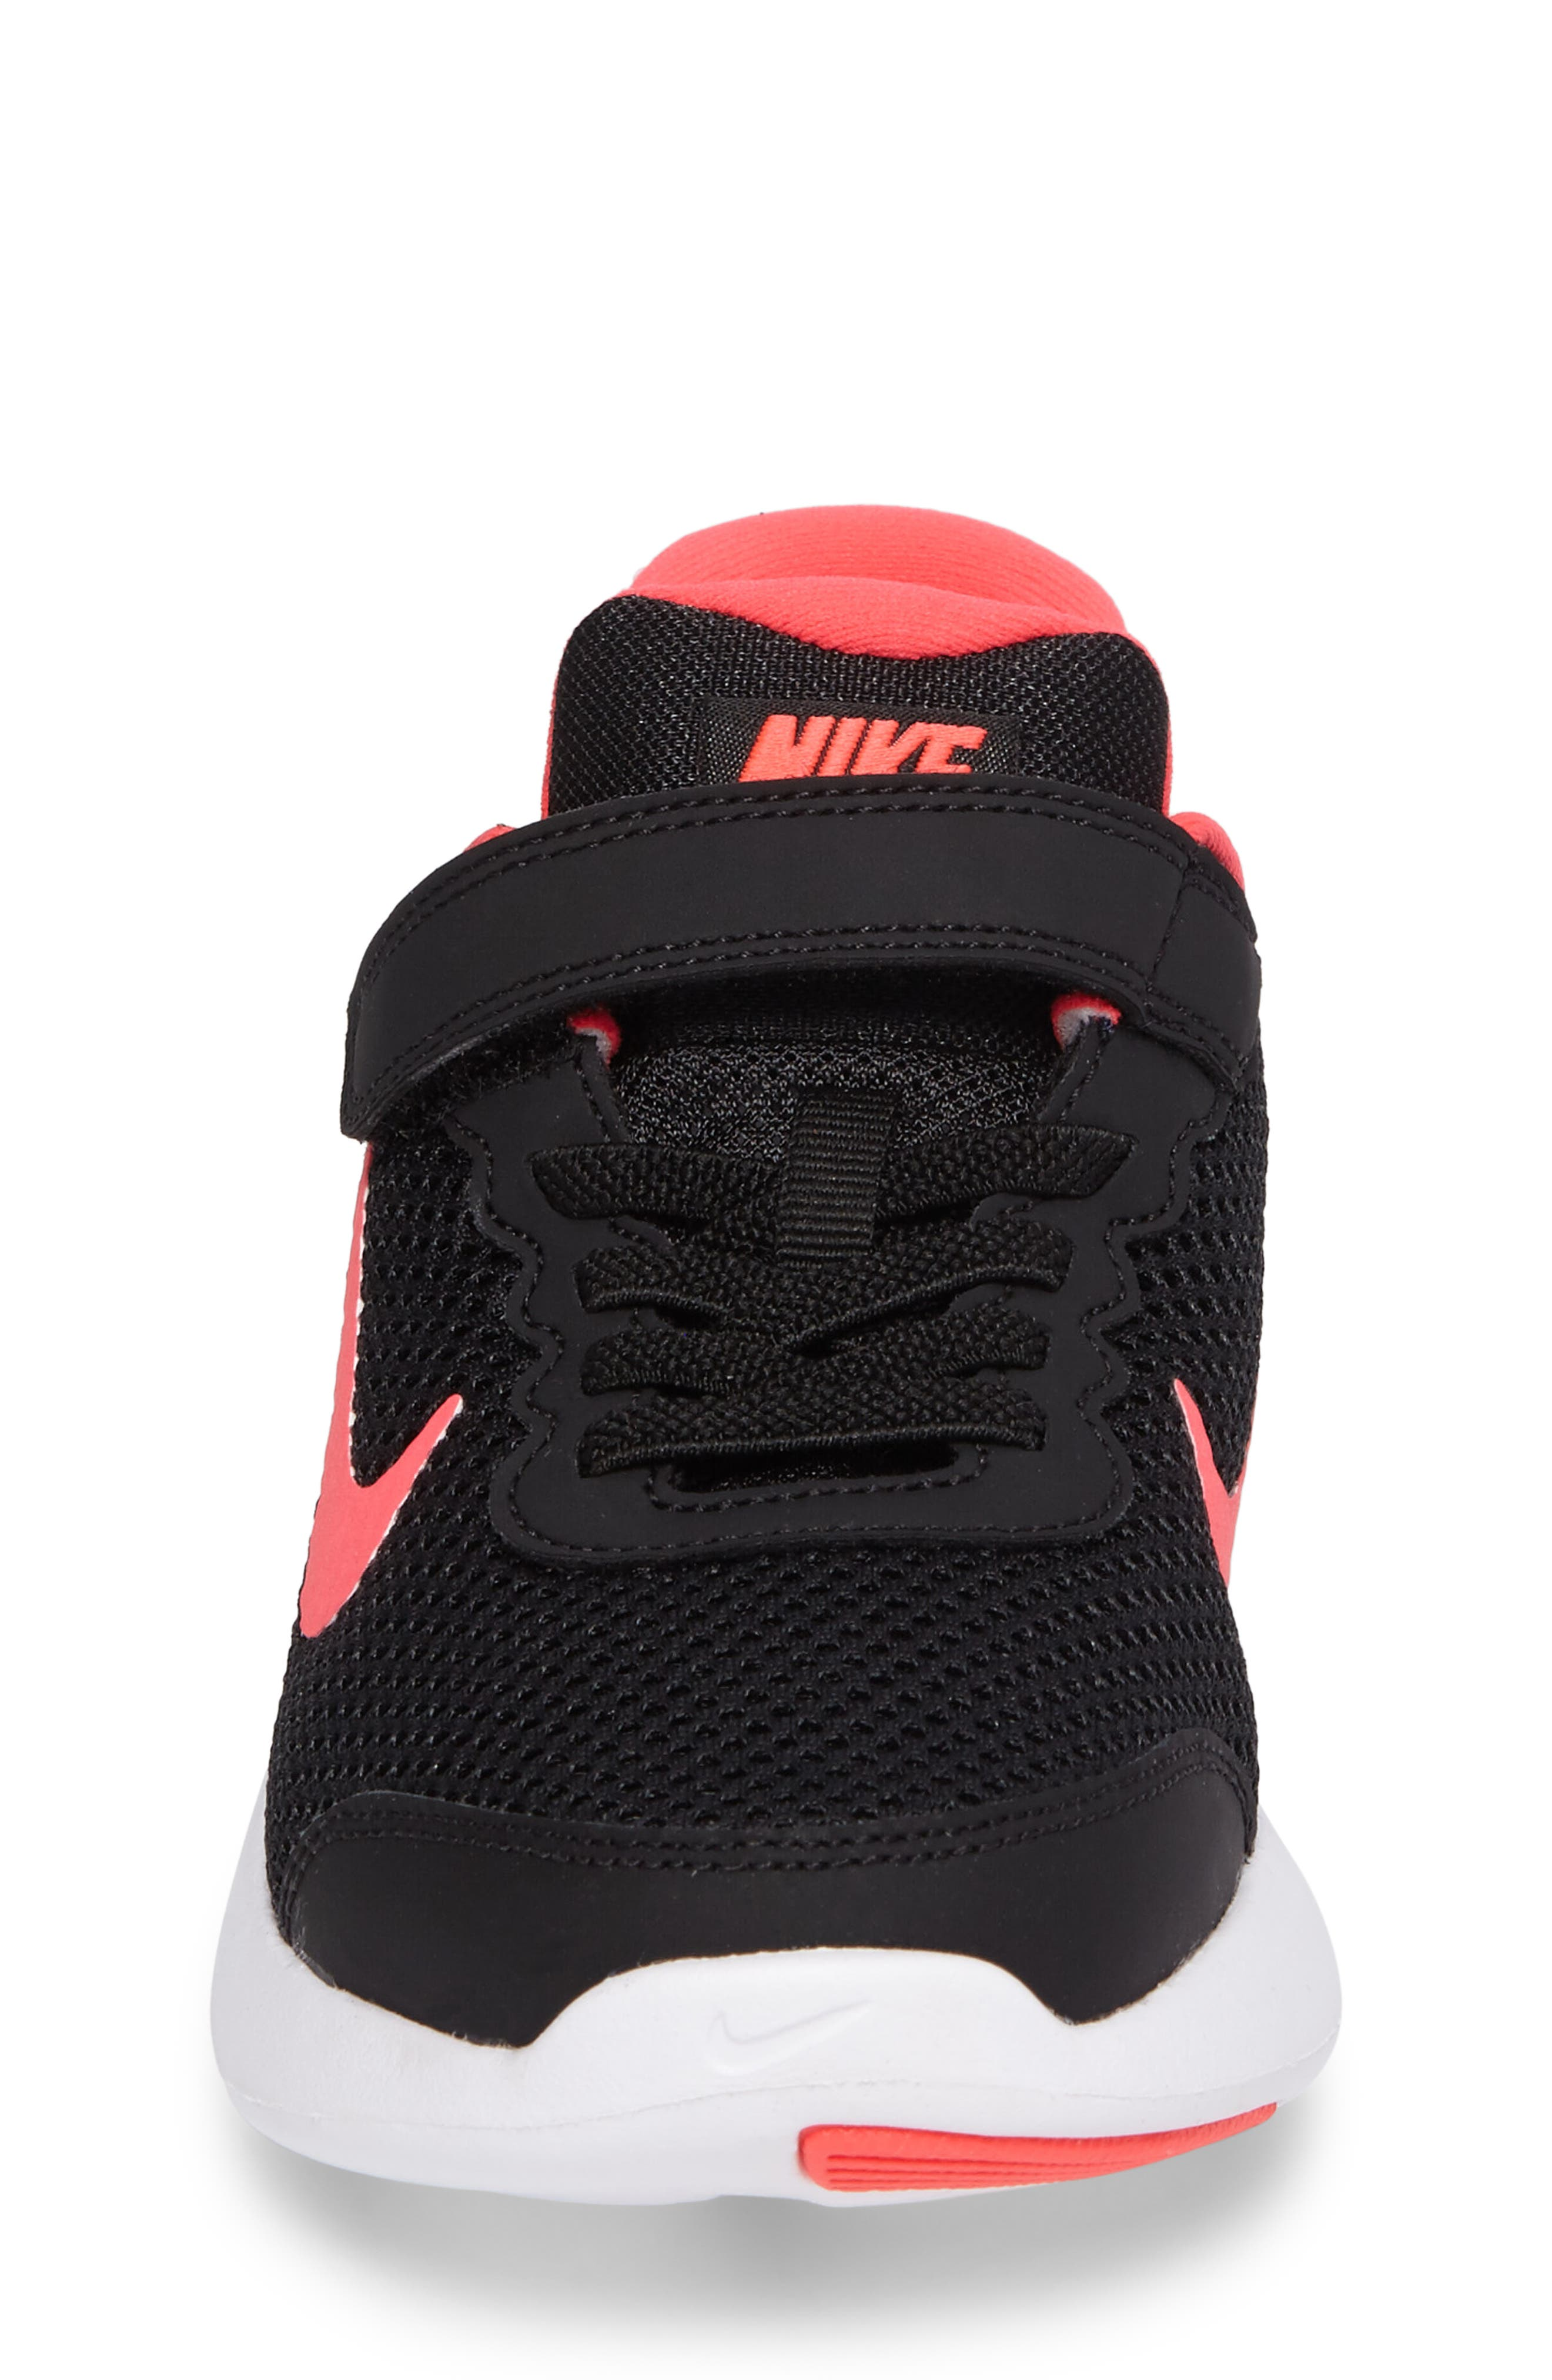 Lunar Apparent Sneaker,                             Alternate thumbnail 4, color,                             Black/ Racer Pink/ White